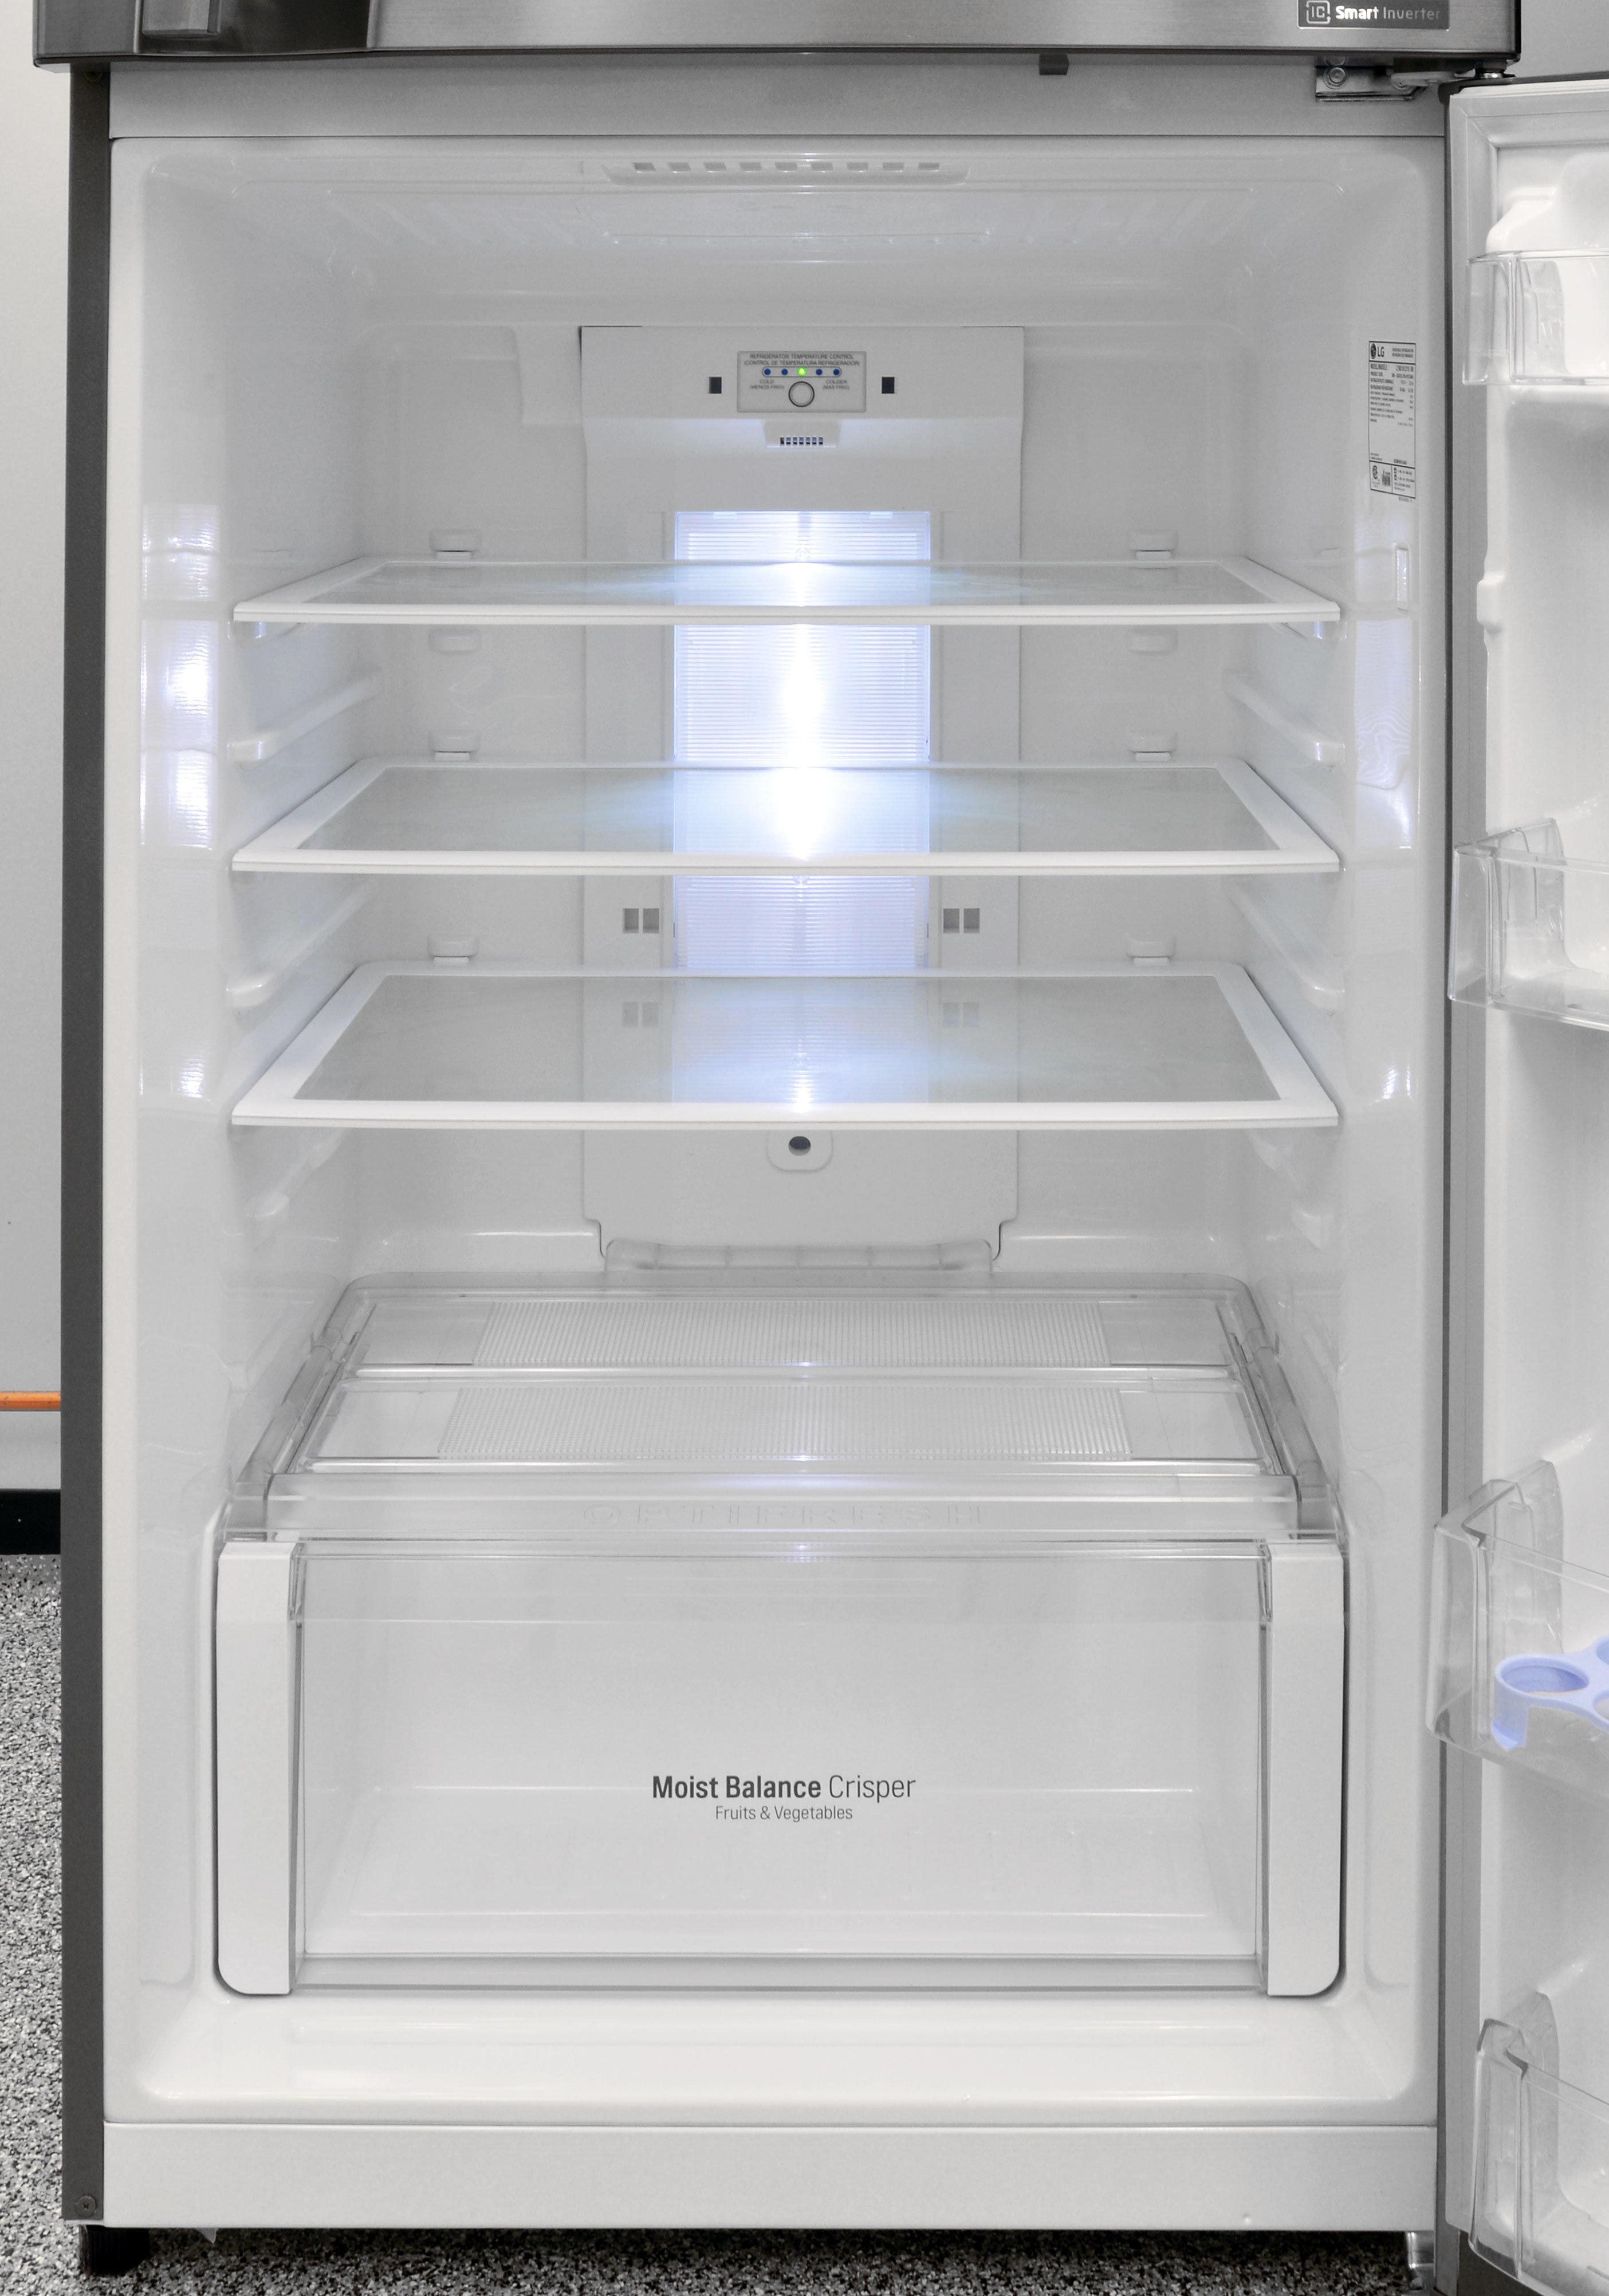 The LG LTNS16121V's fridge interior is stylish, but the LED lighting is surprisingly dim.